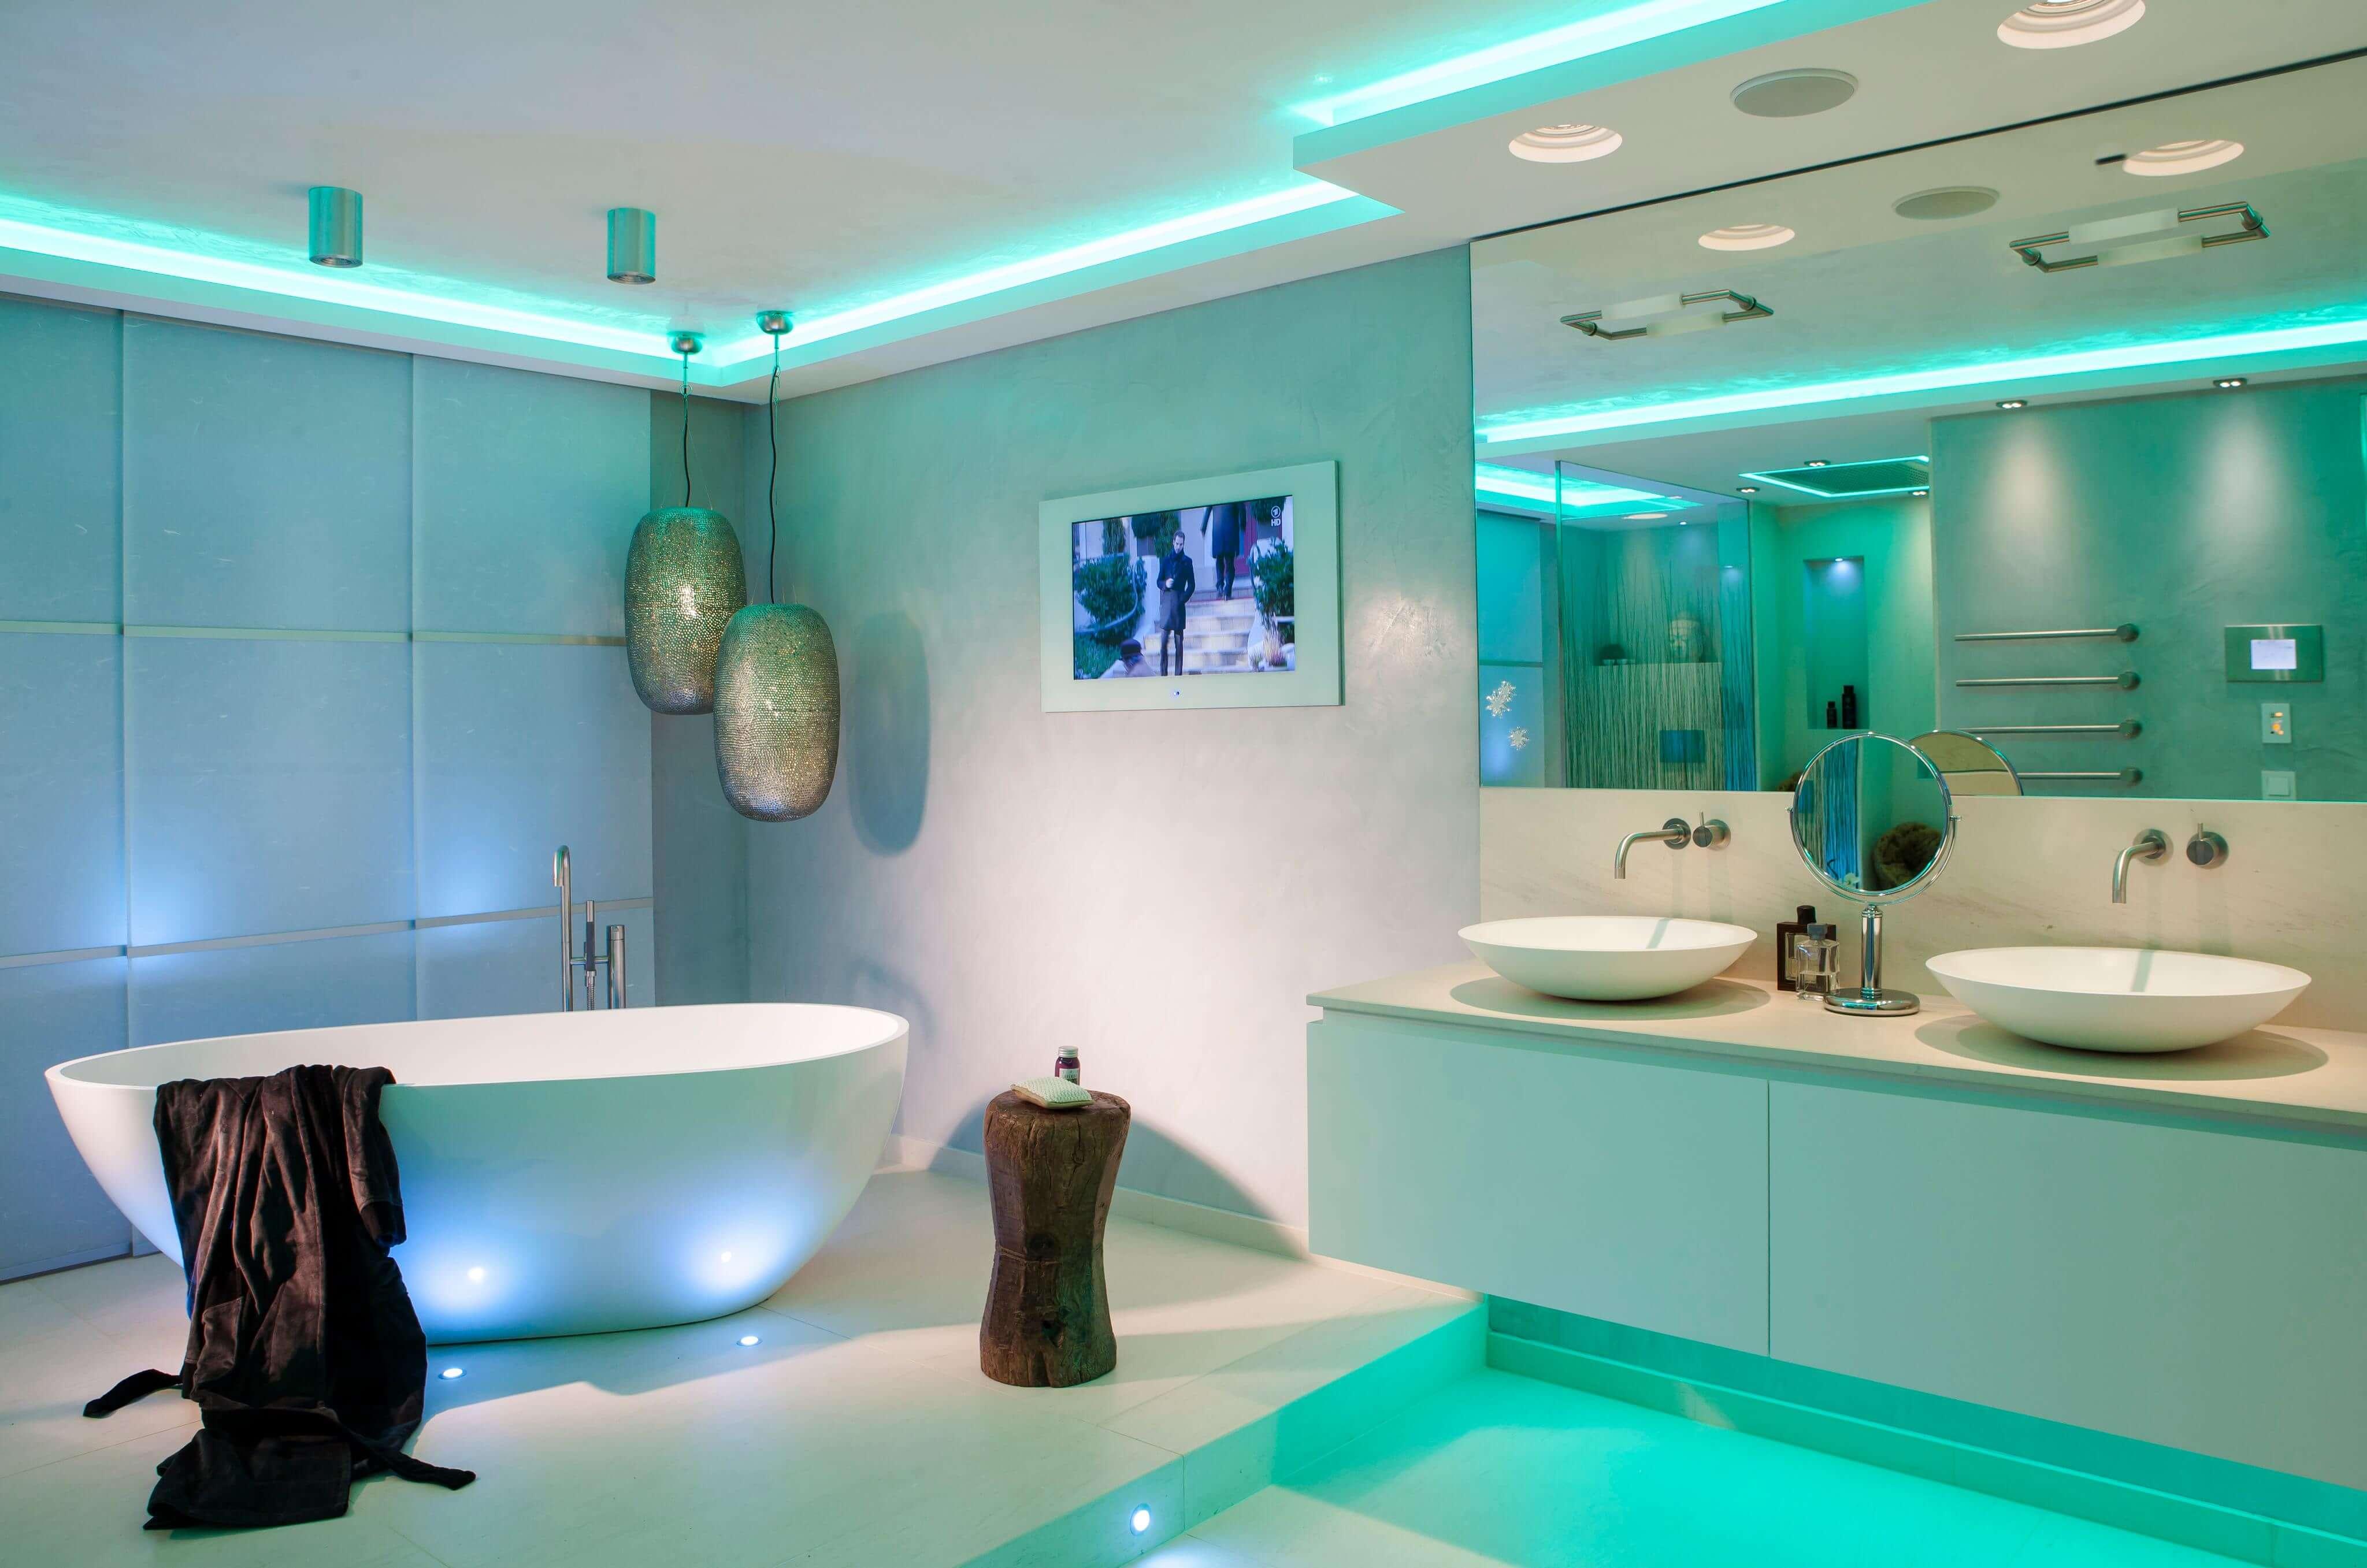 alexa f r ein barrierefreies bad smart home im praxistest. Black Bedroom Furniture Sets. Home Design Ideas